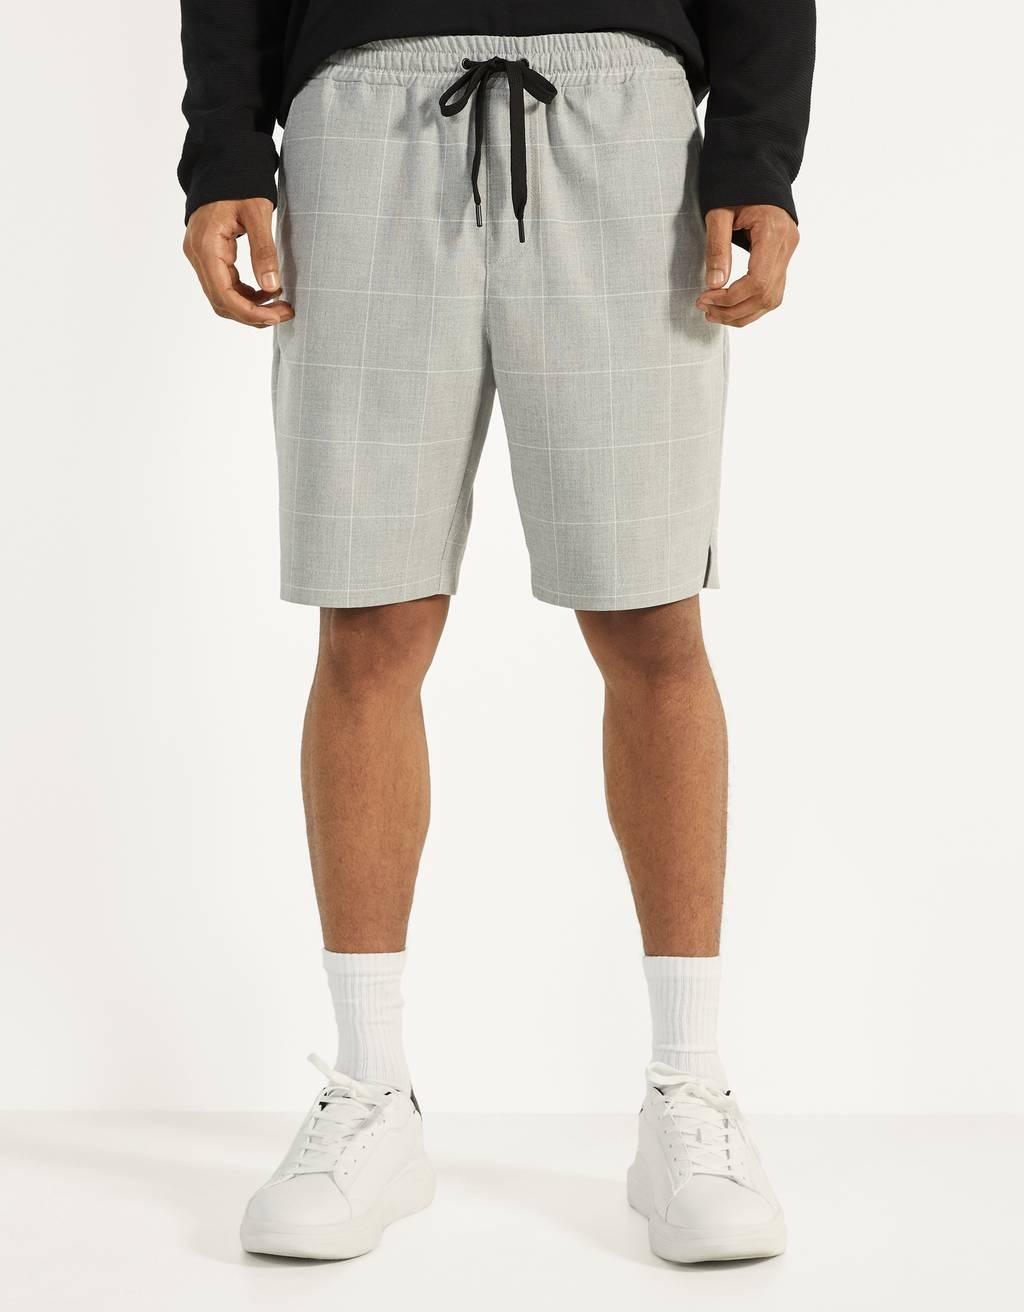 Bermuda style jogger